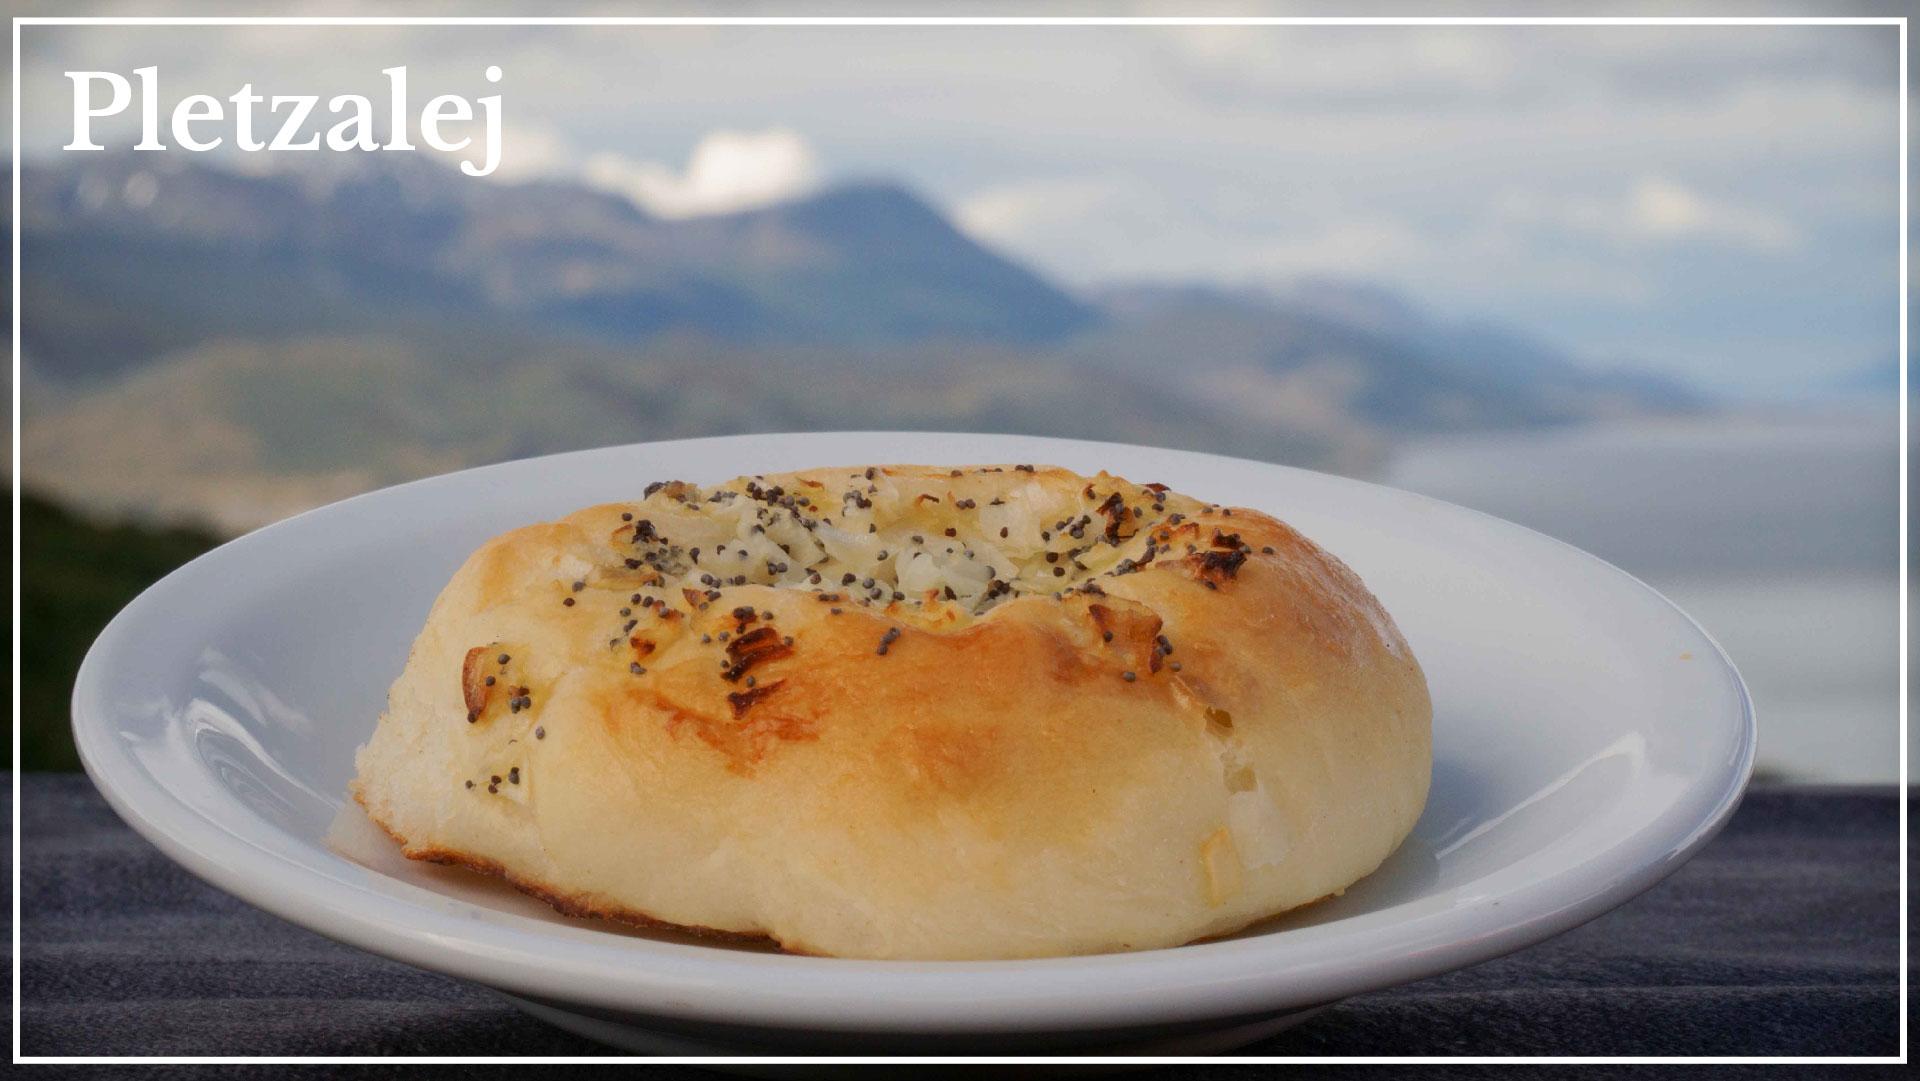 Pletzalej - based on kosher flour and poppies